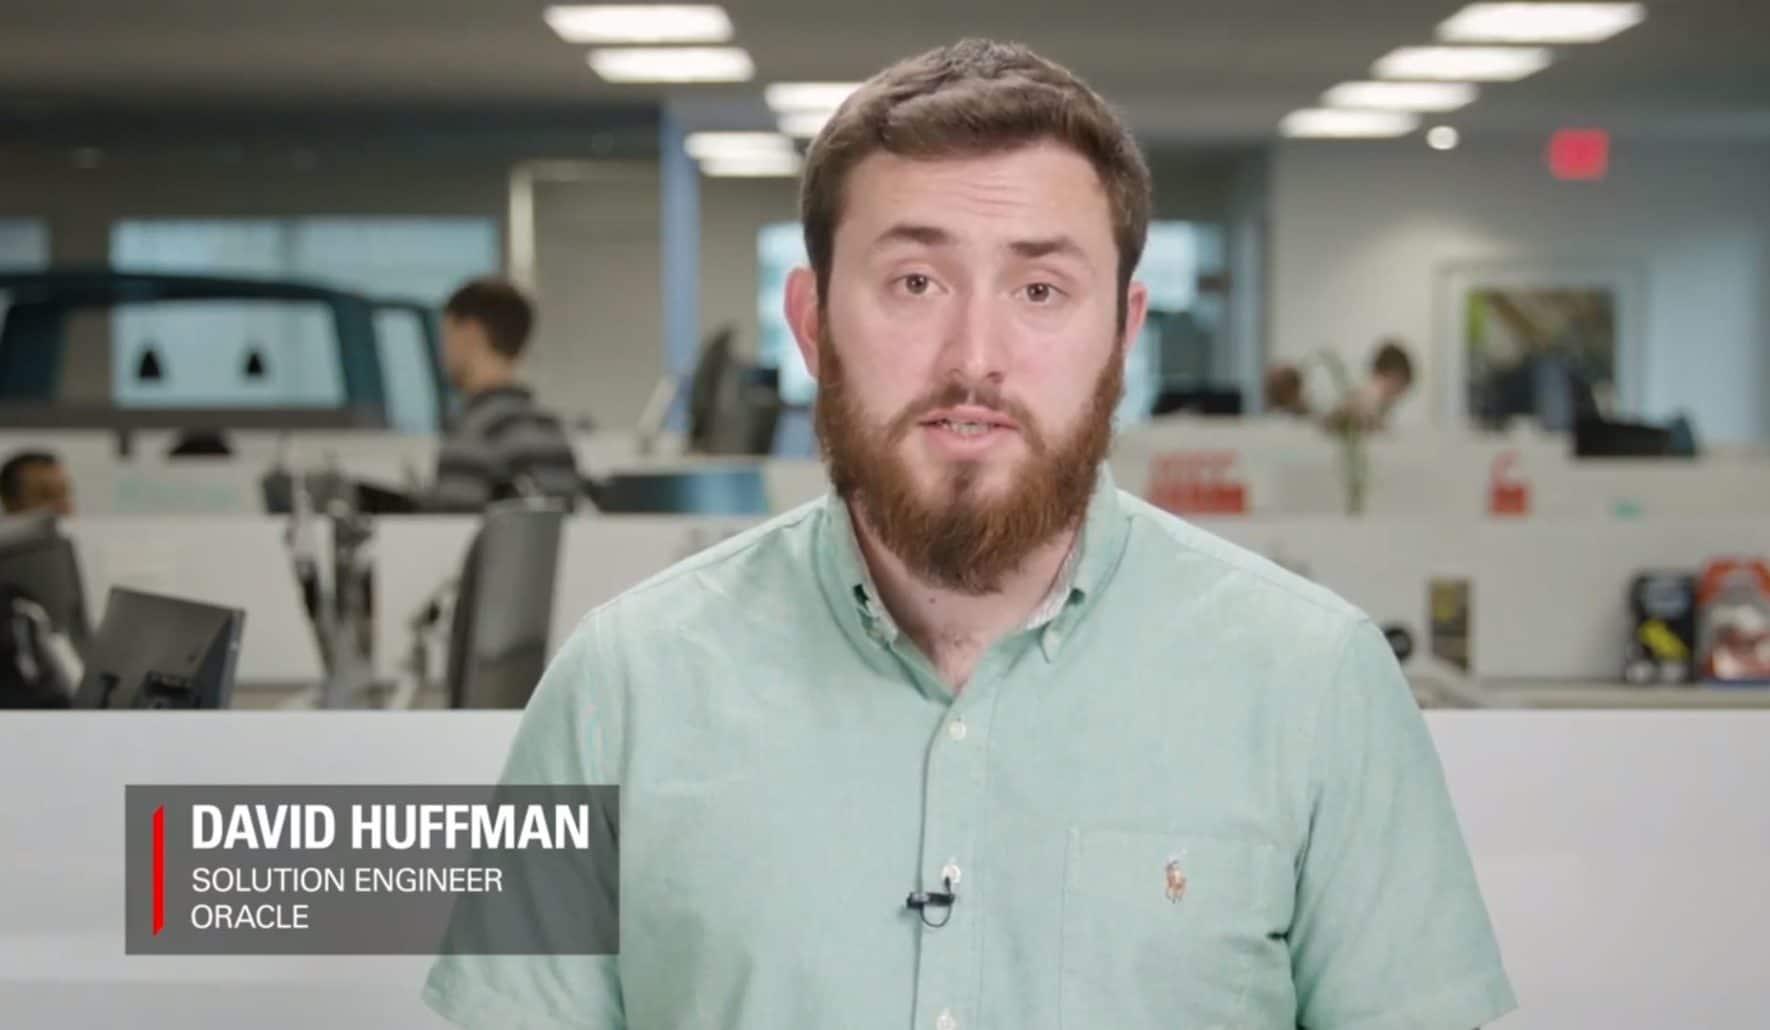 David Huffman screenshot from video